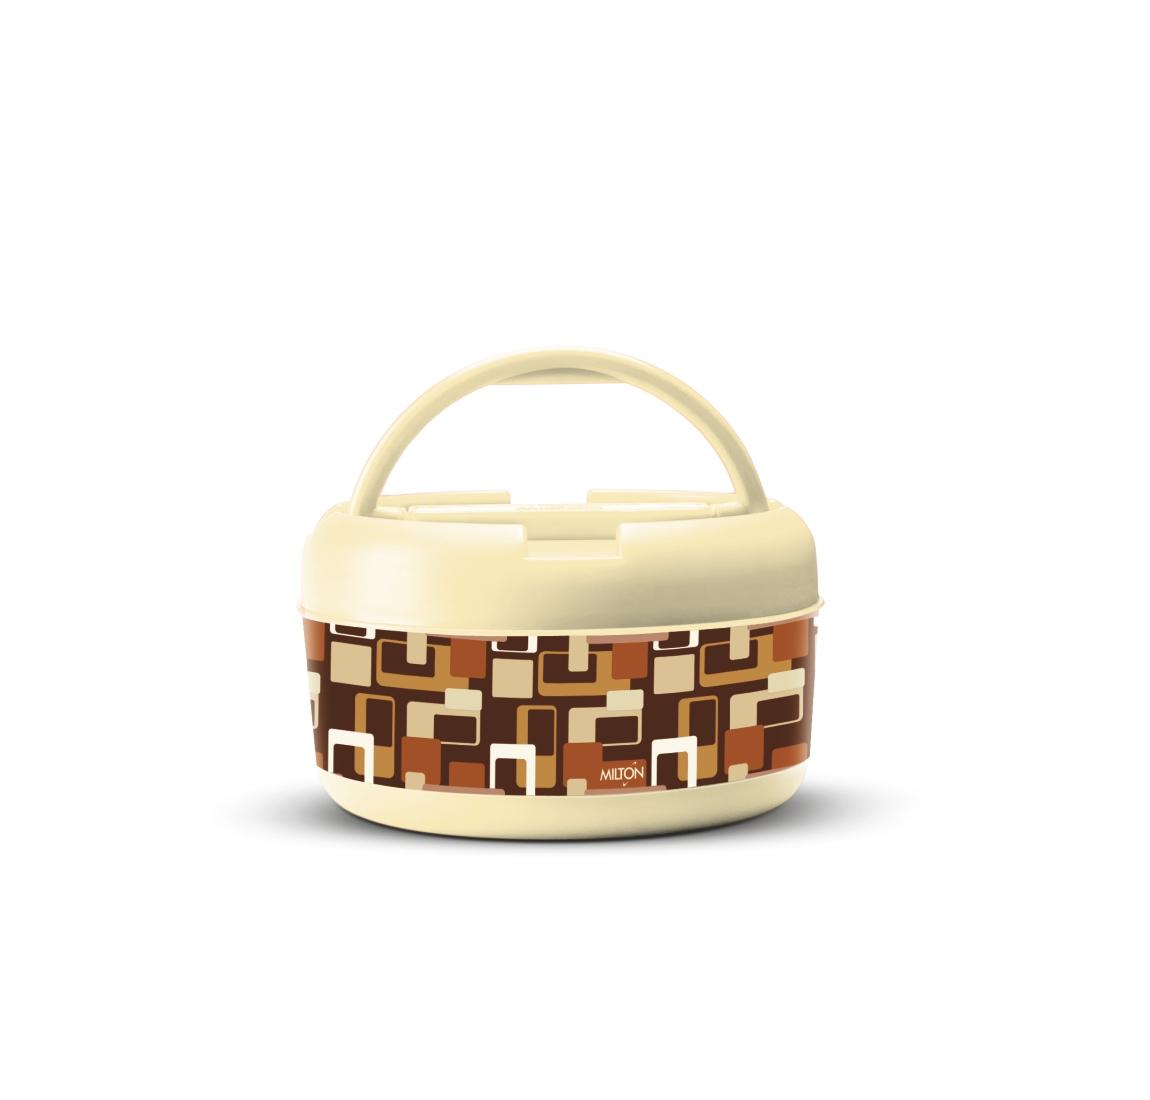 Brunch Lunchbox 500ml